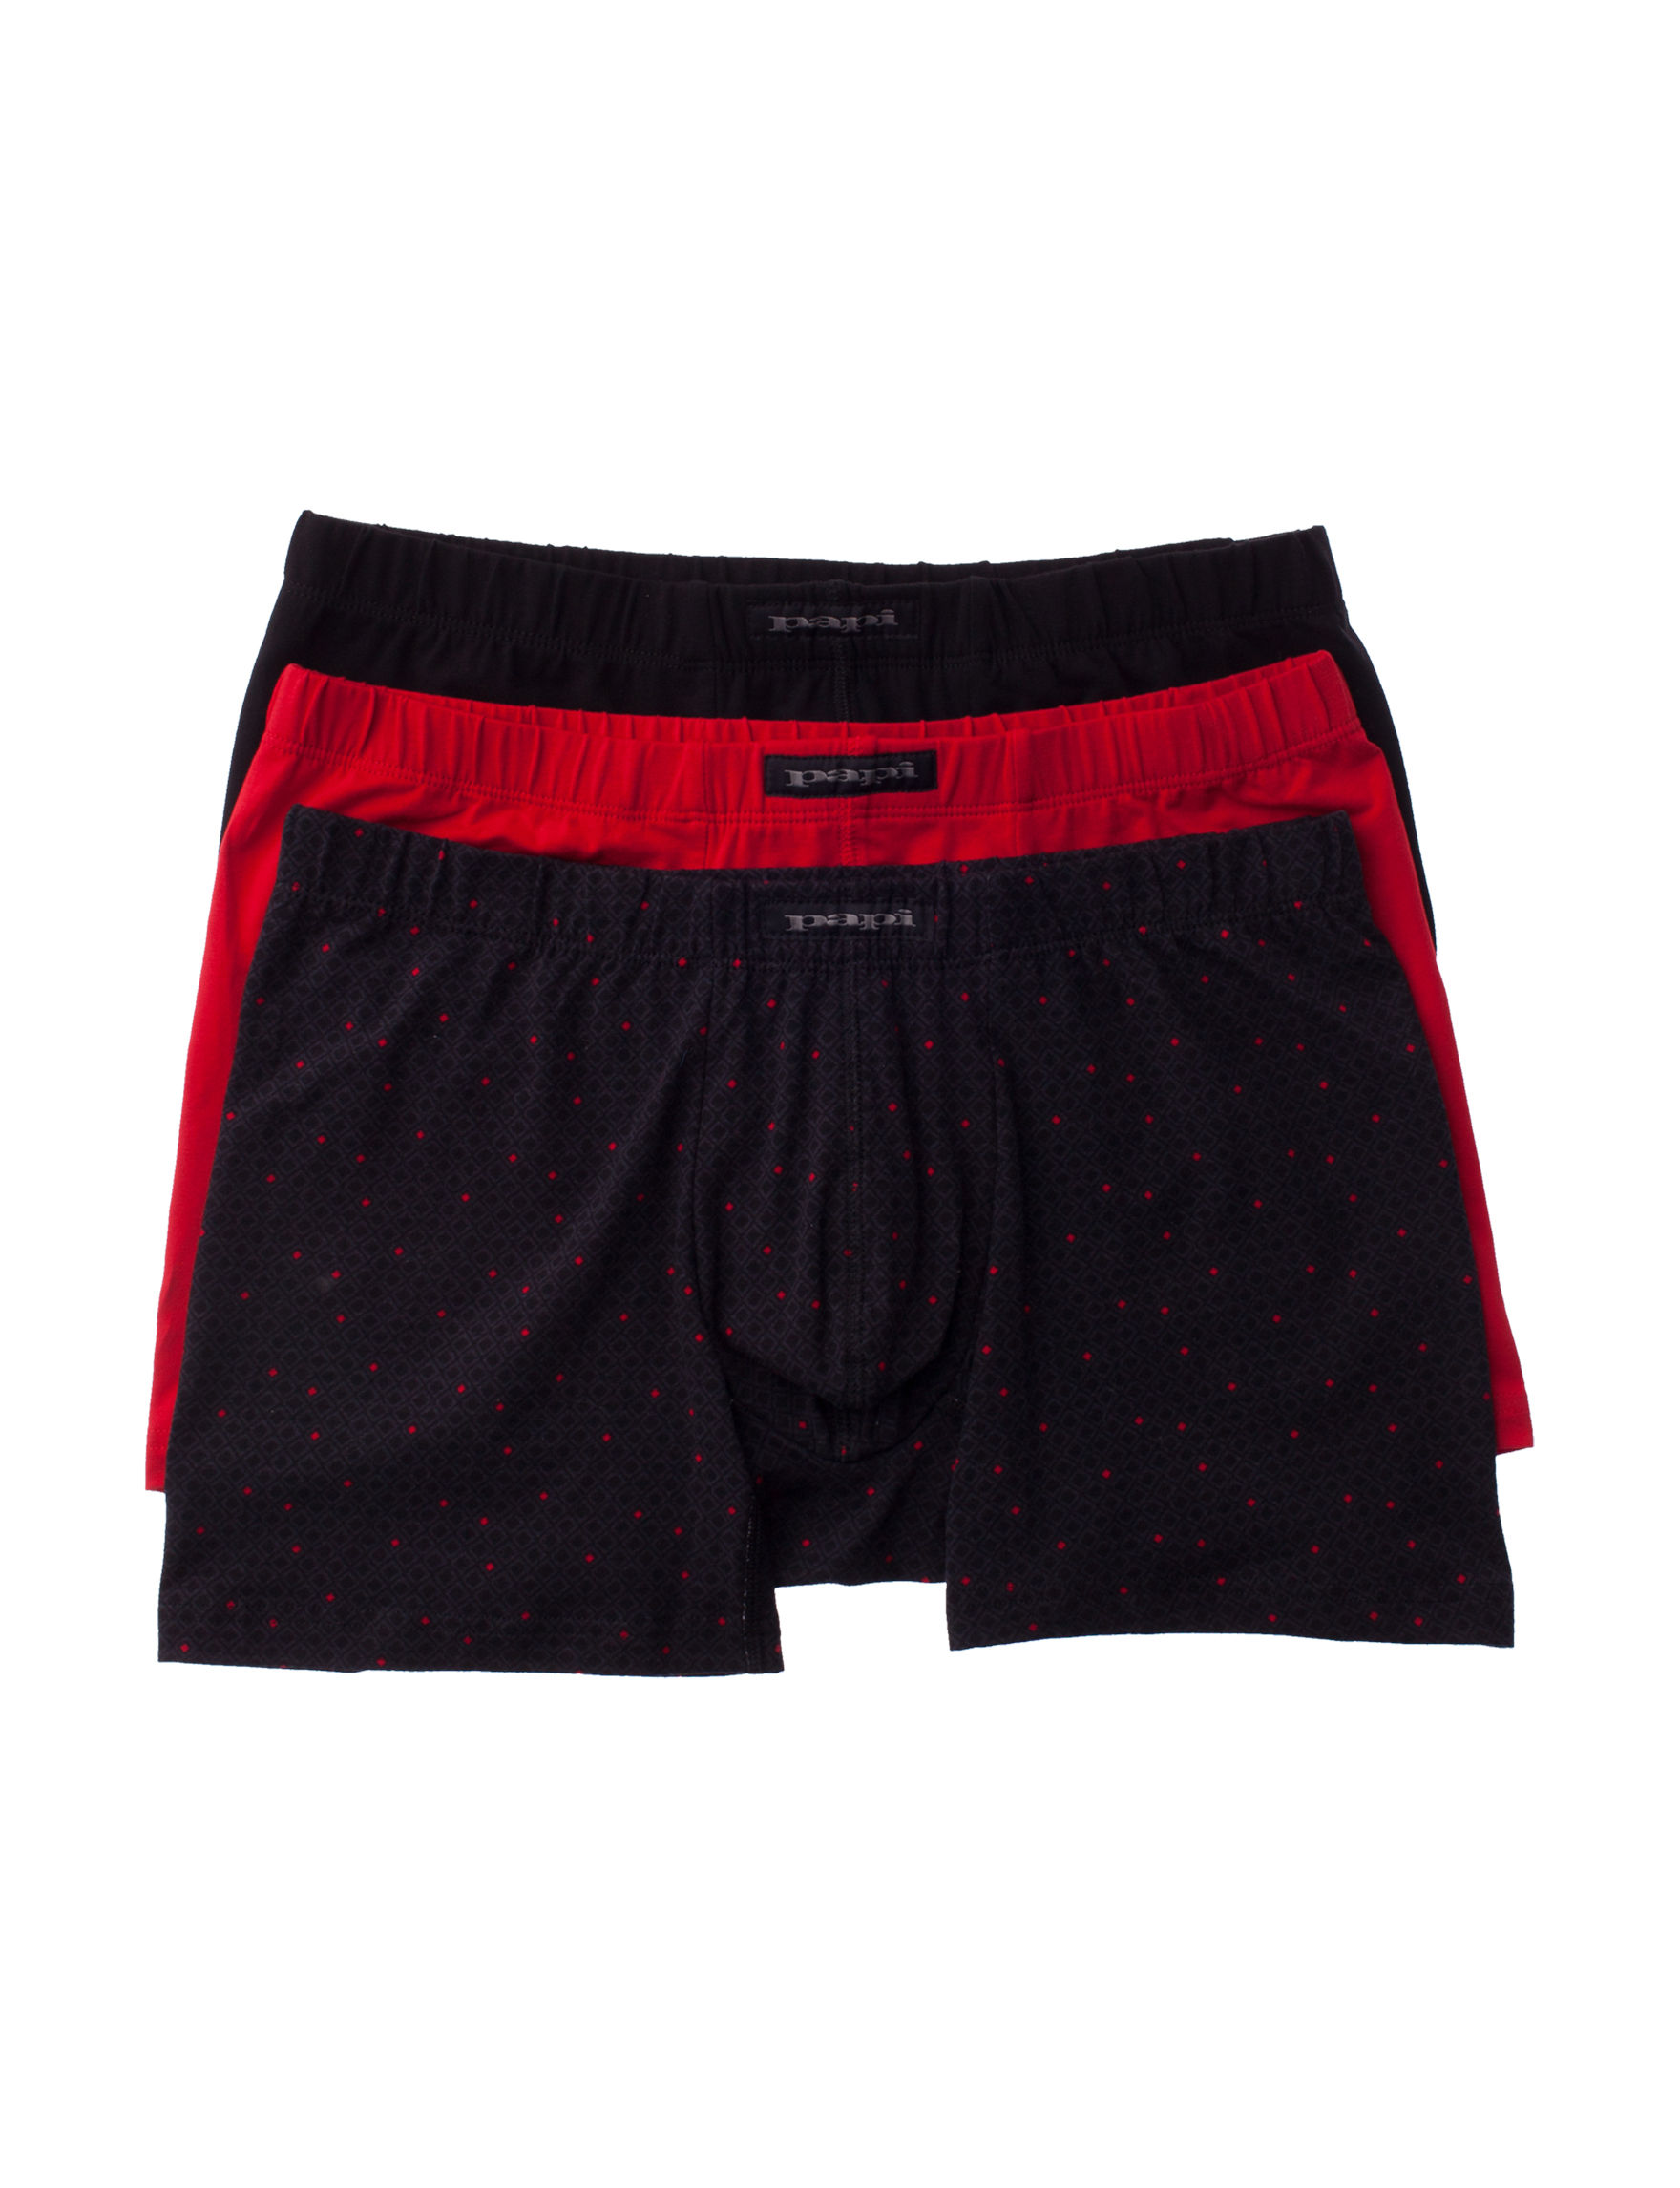 Papi Red / Black Boxer Briefs